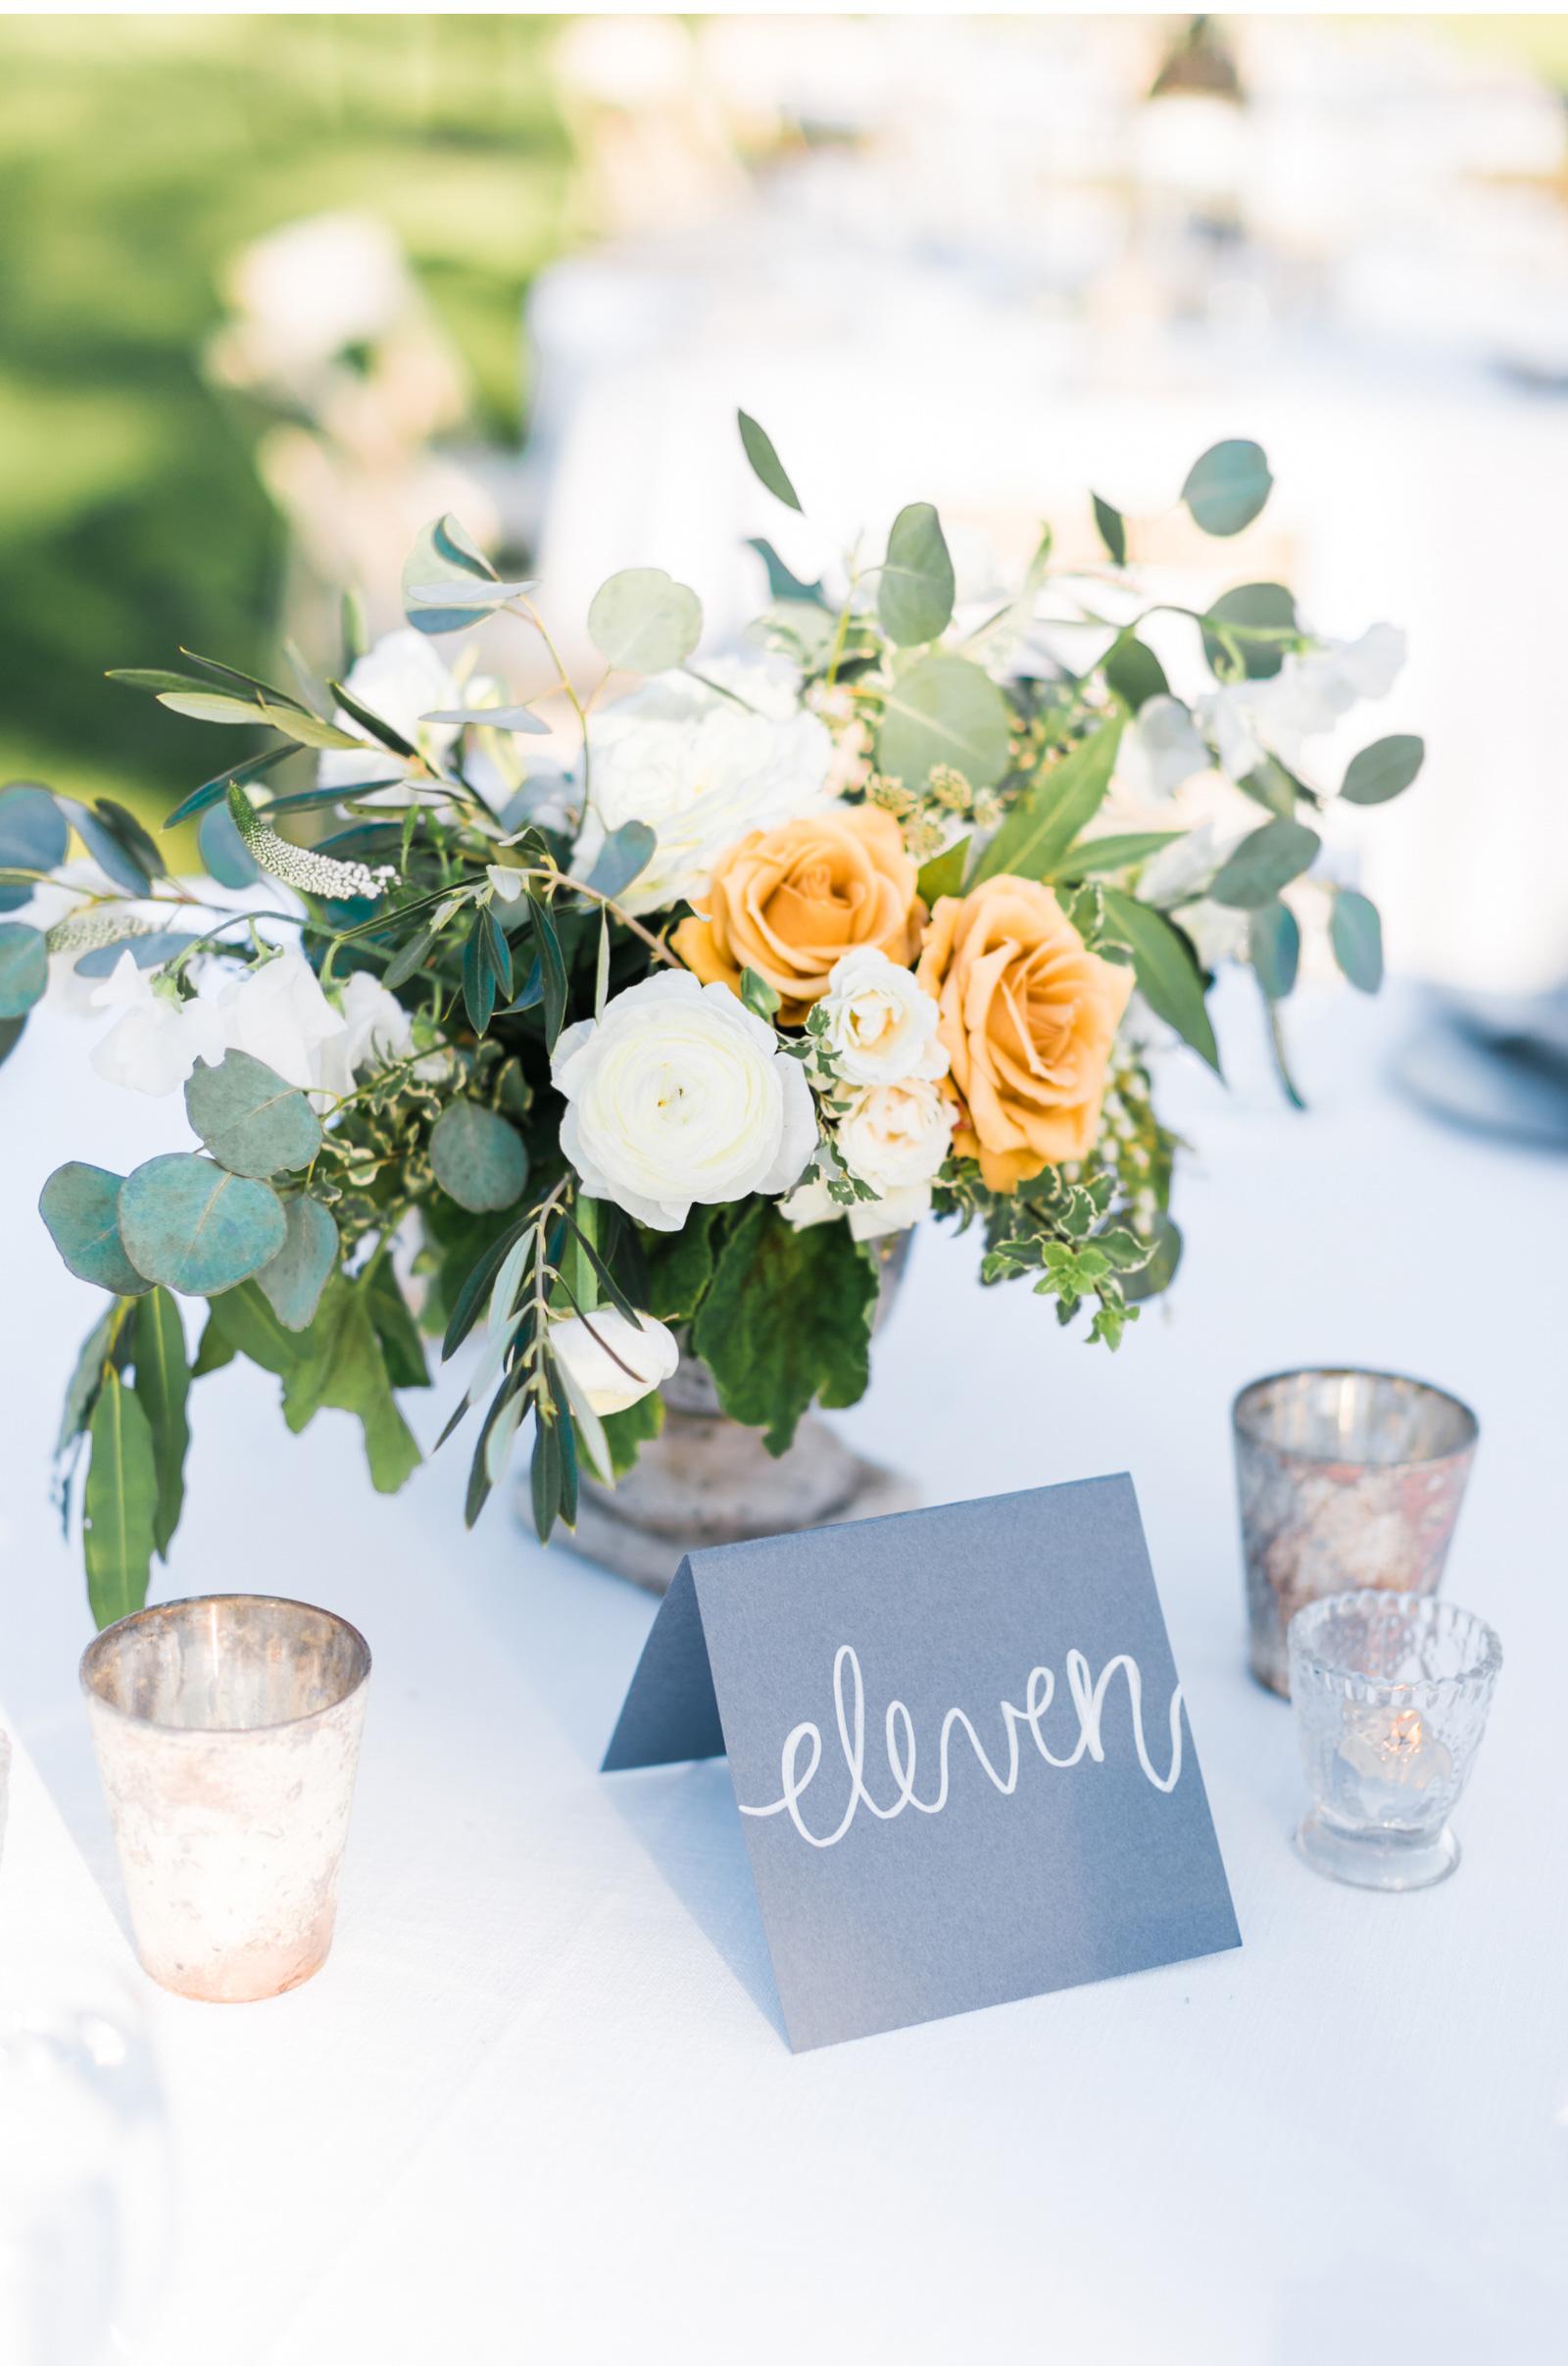 Malibu-Wedding-Photographer-Triunfo-Creek-Natalie-Schutt-Photography_01.jpg